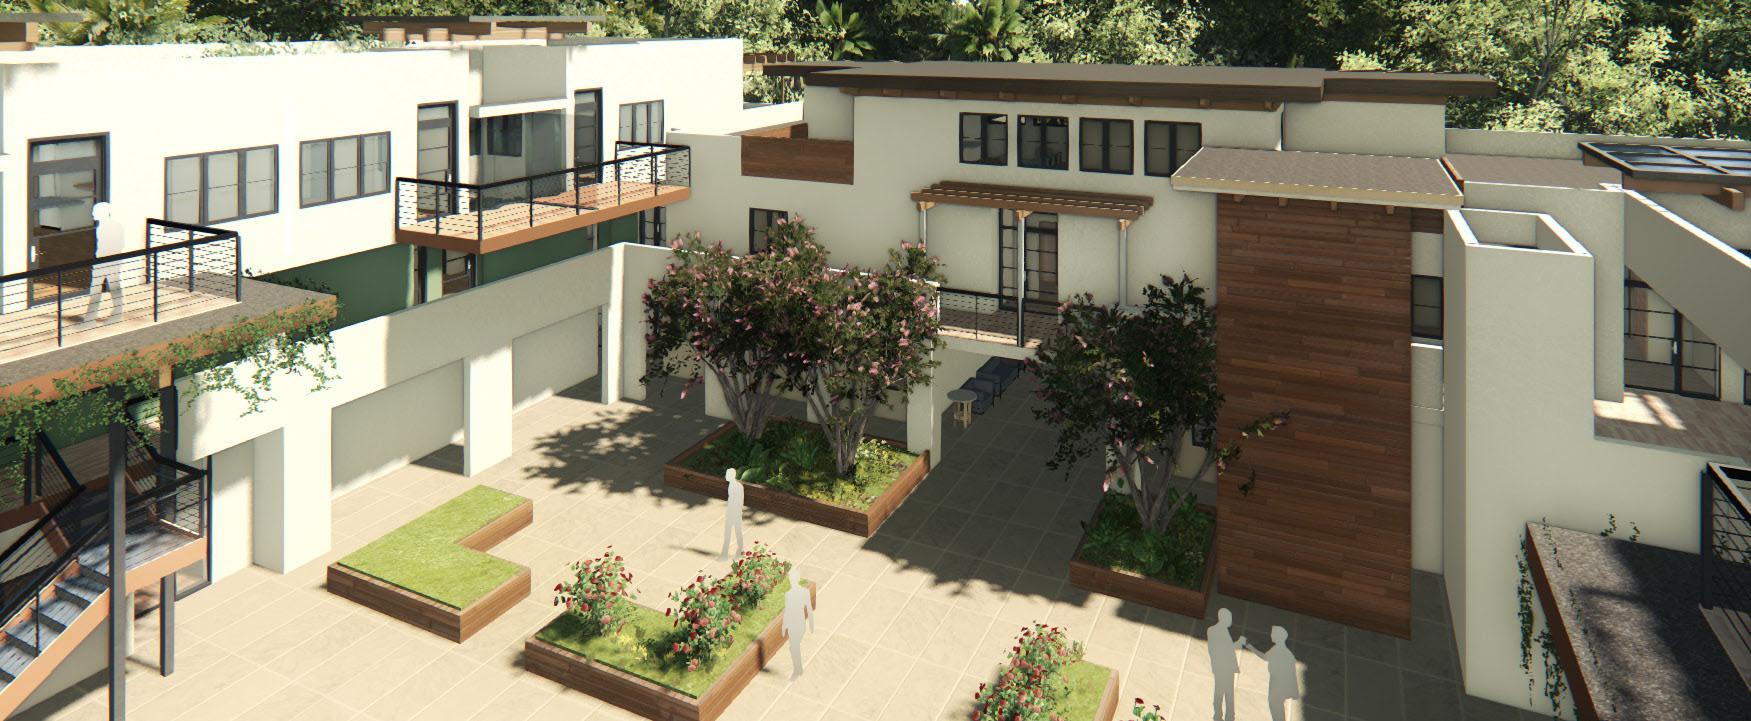 Los Angeles Development Company